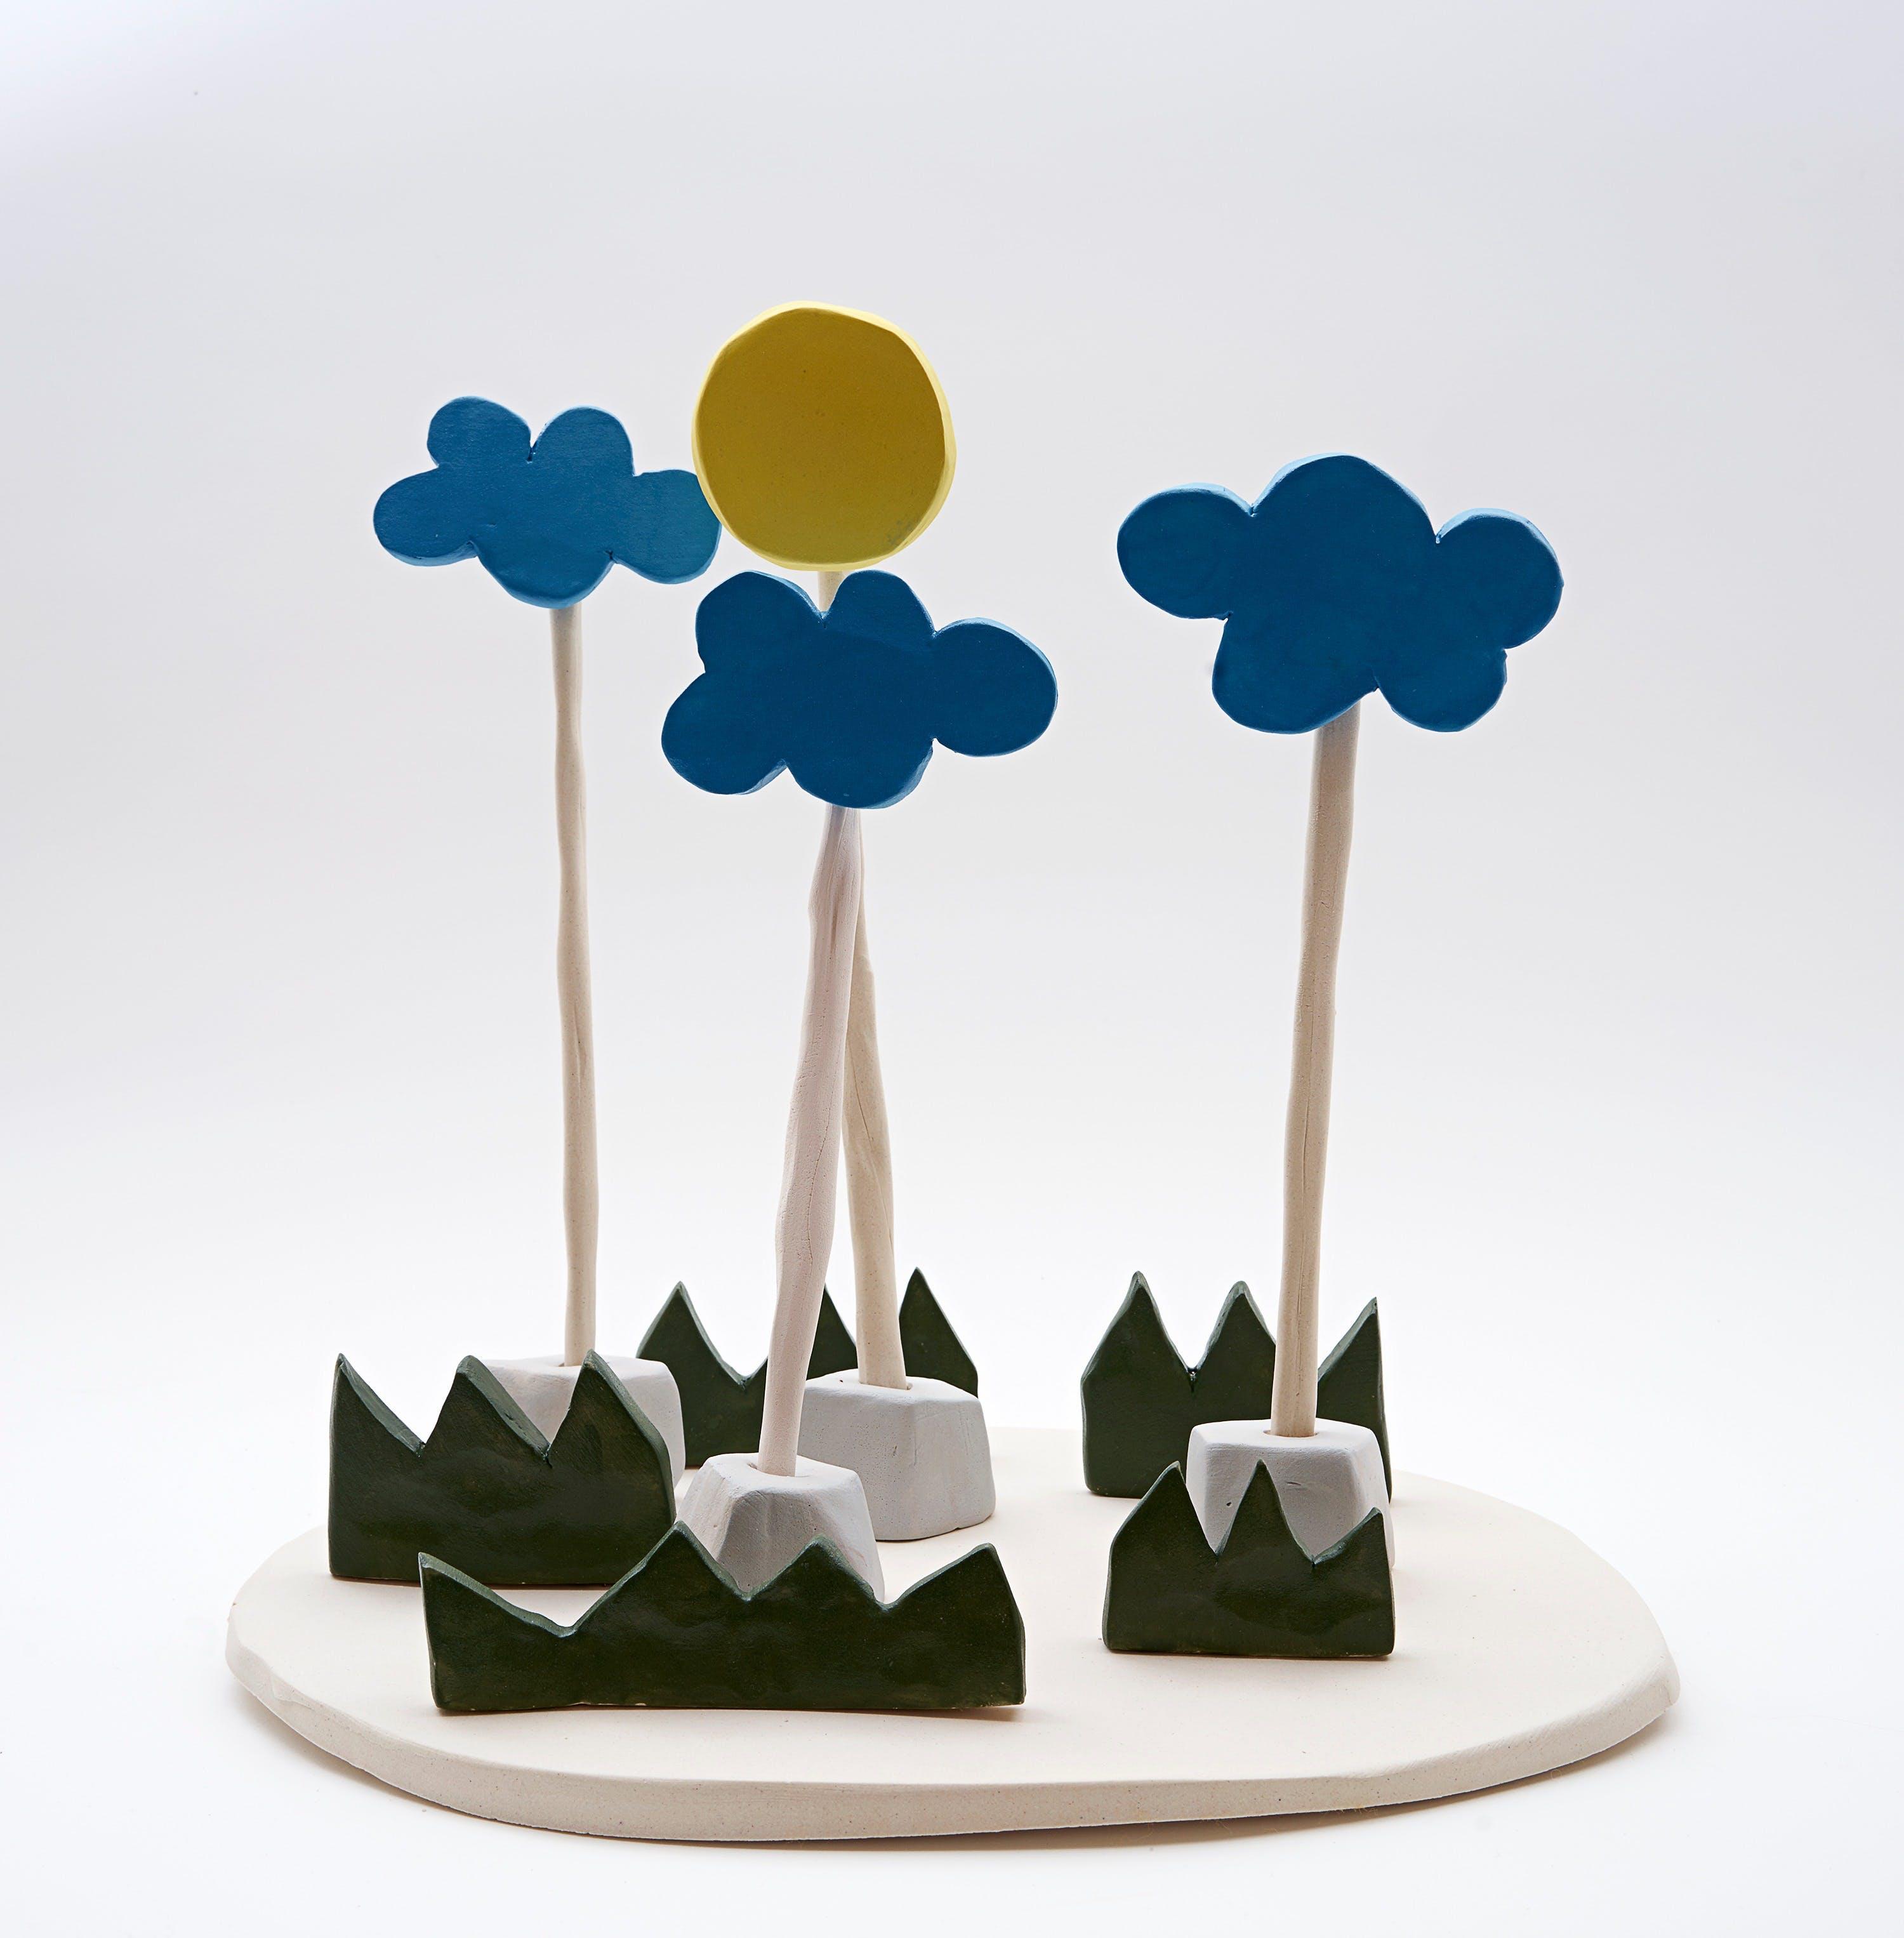 Olaf Breuning, Sun and clouds, 2016